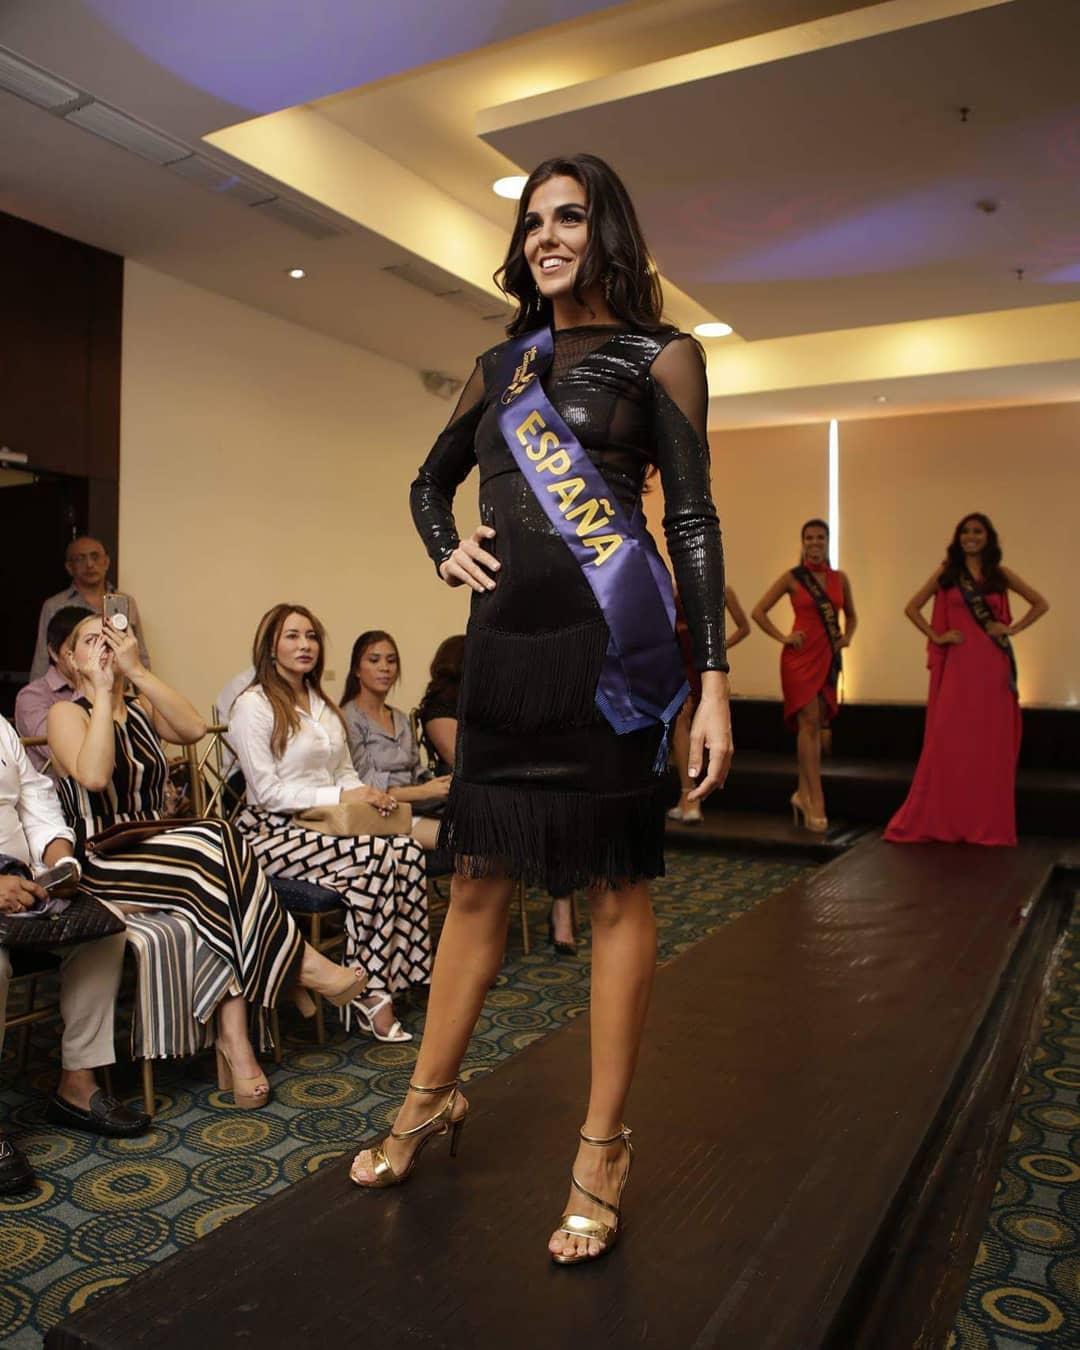 cynthia ruz lopez escobar, 3rd runner-up de miss continentes unidos 2018. - Página 2 40724810